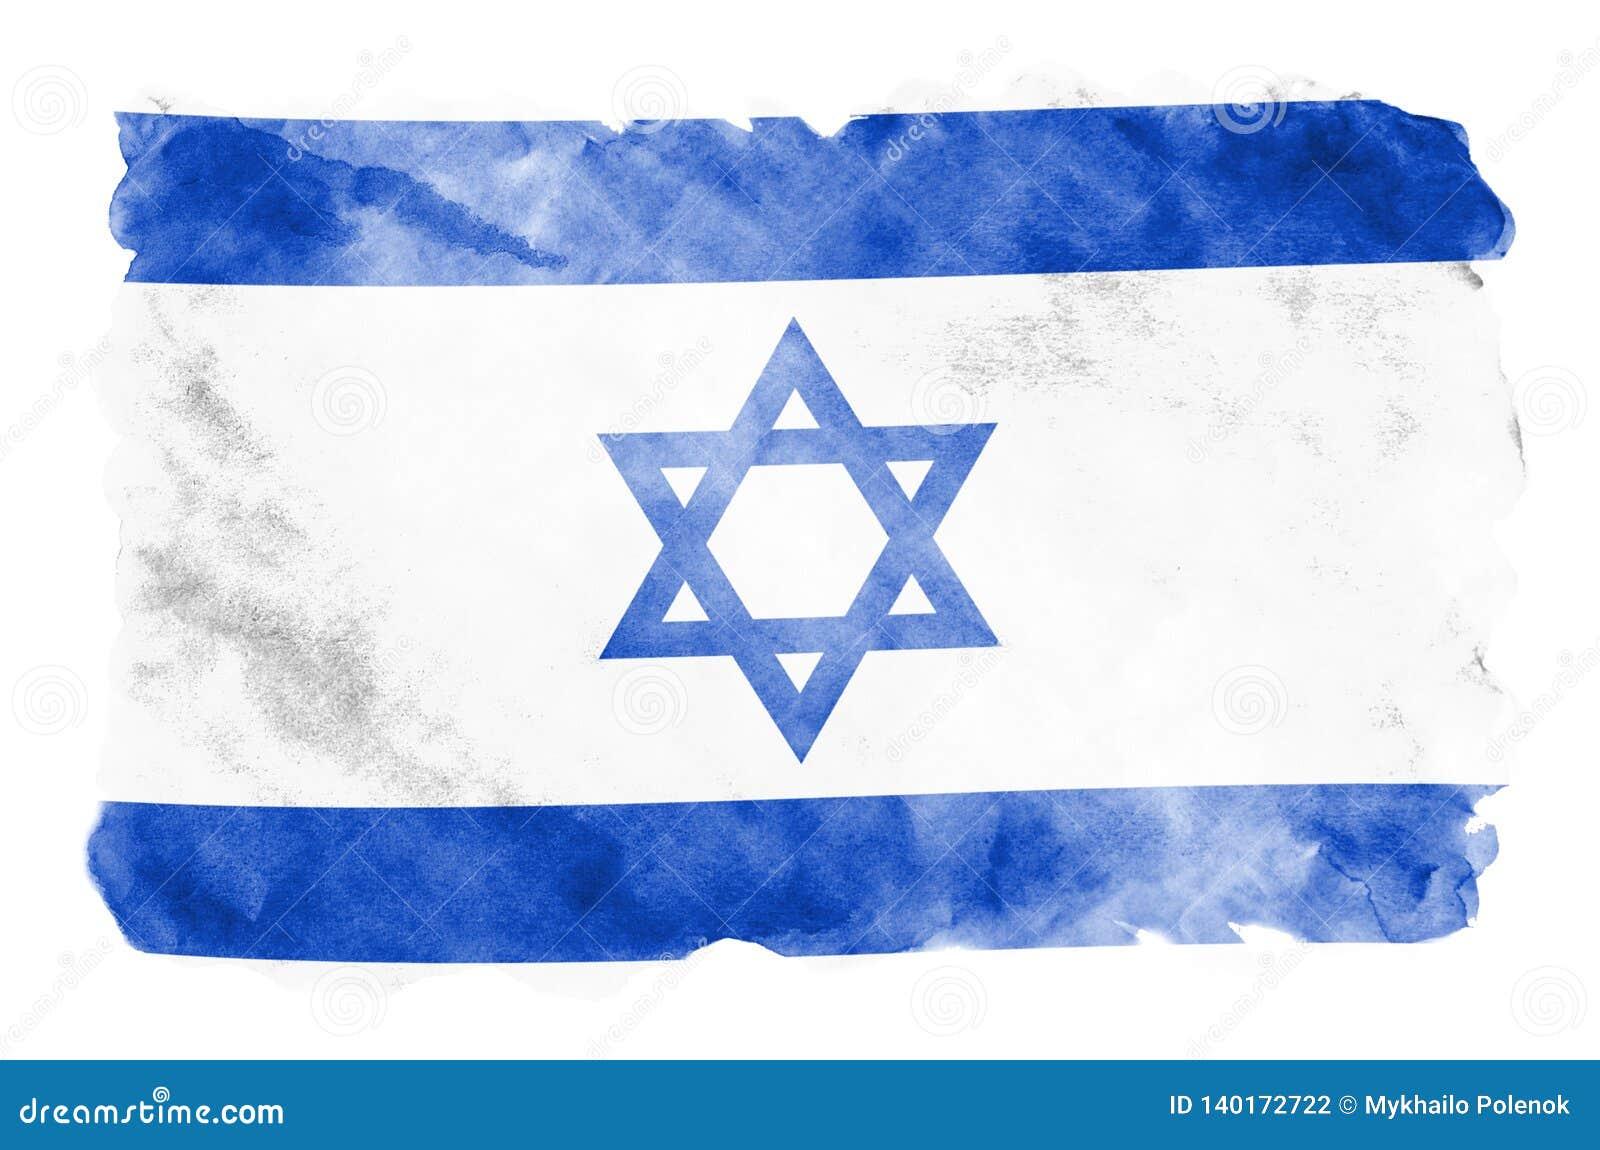 A bandeira de Israel é descrita no estilo líquido da aquarela isolada no fundo branco